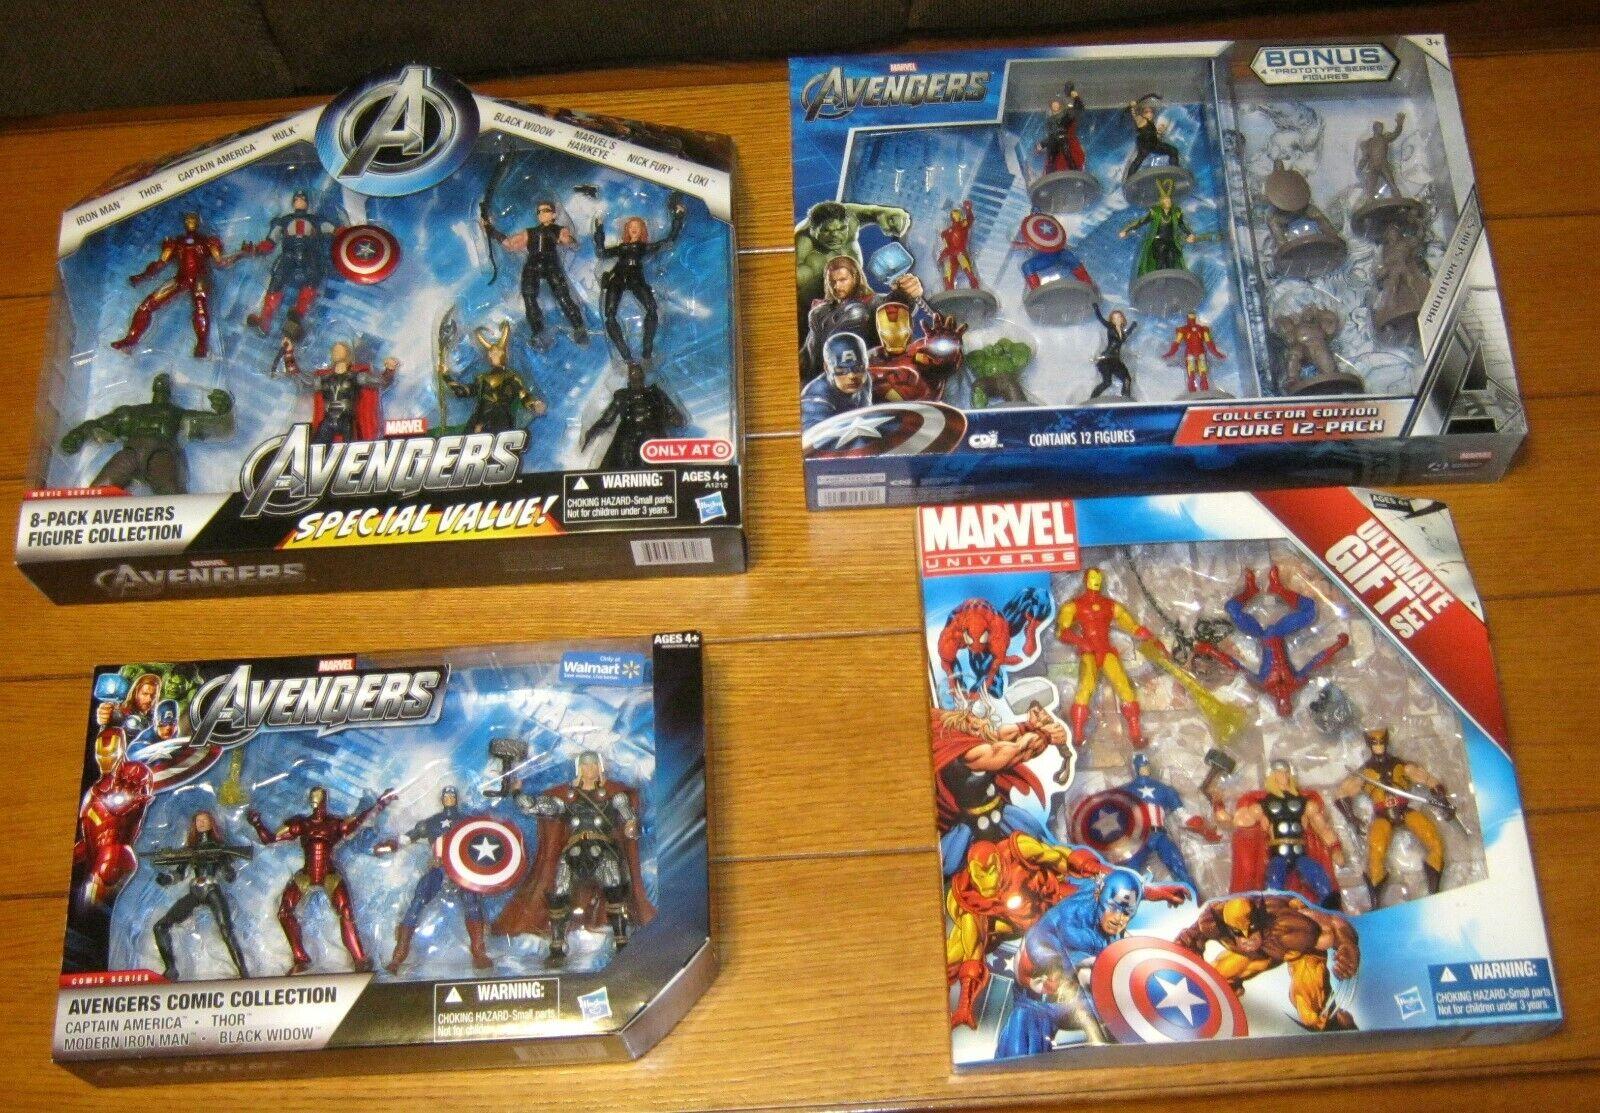 Marvel Avengers Acción Figura Special kits (4 renglones diferentes) W   target & Wal - Mart